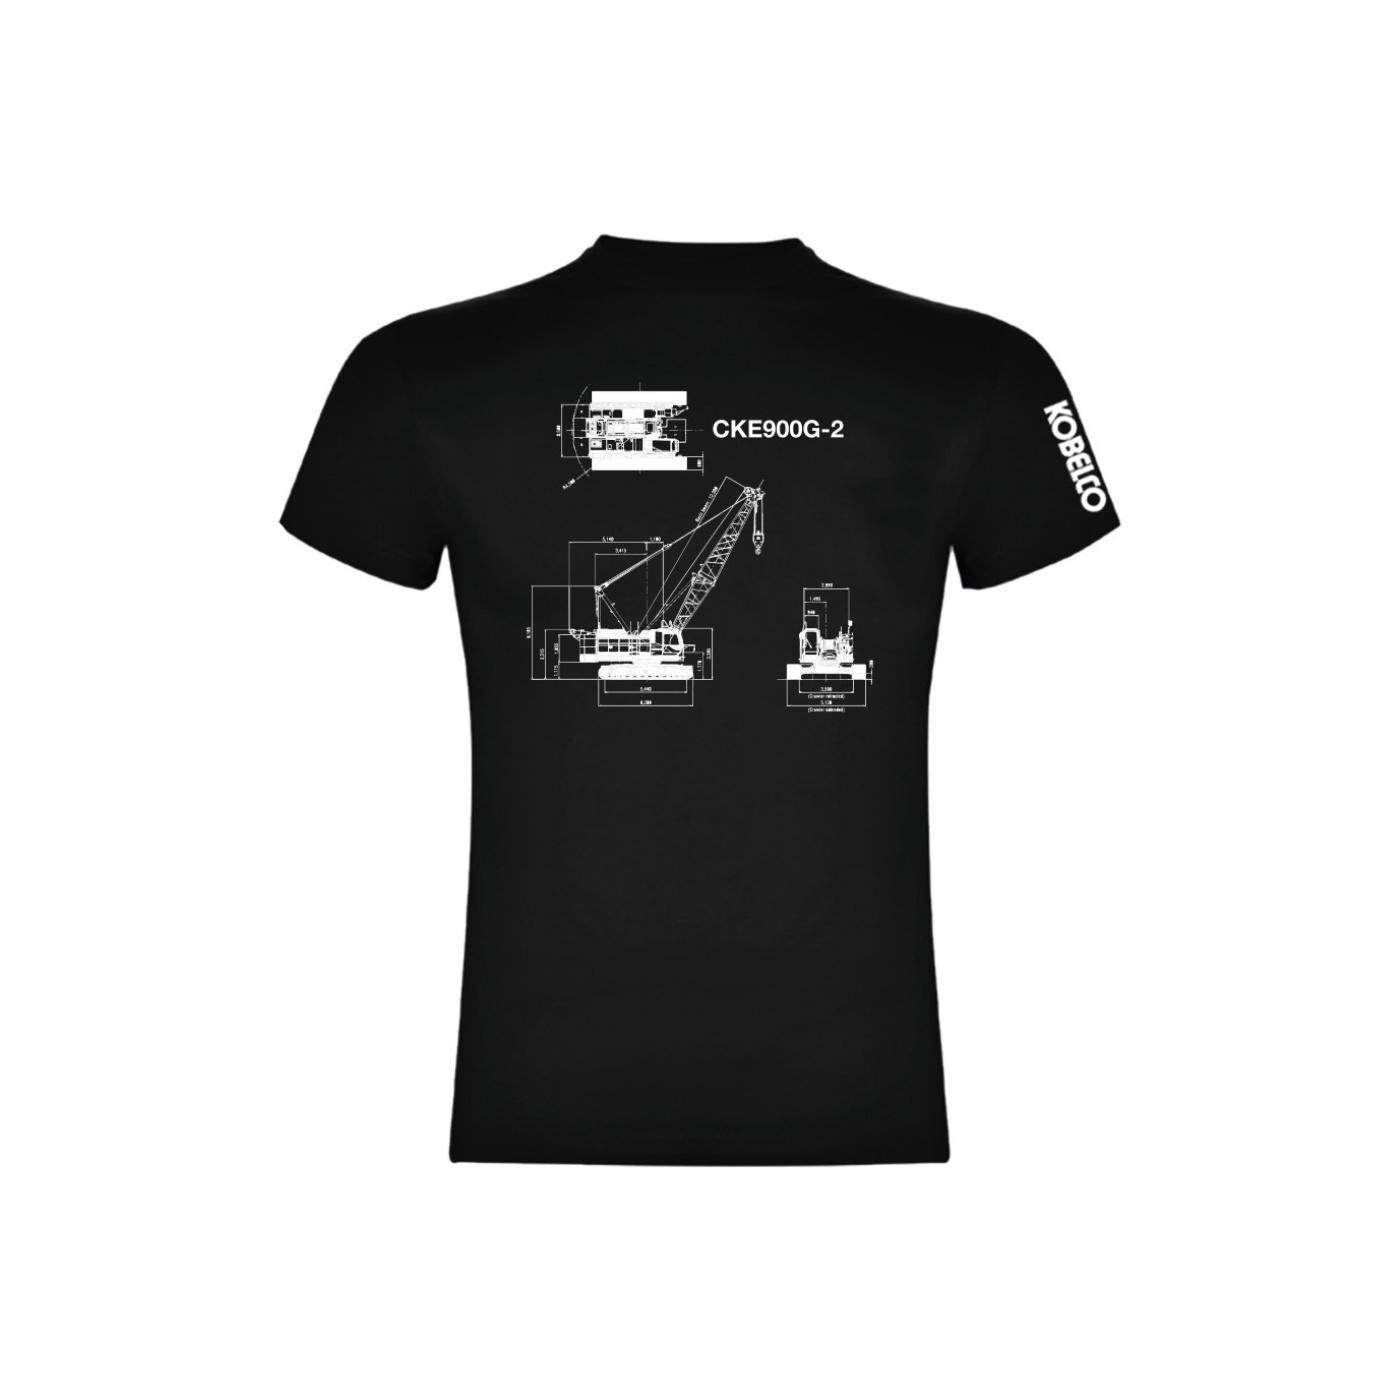 CKE900G-2 T-shirt